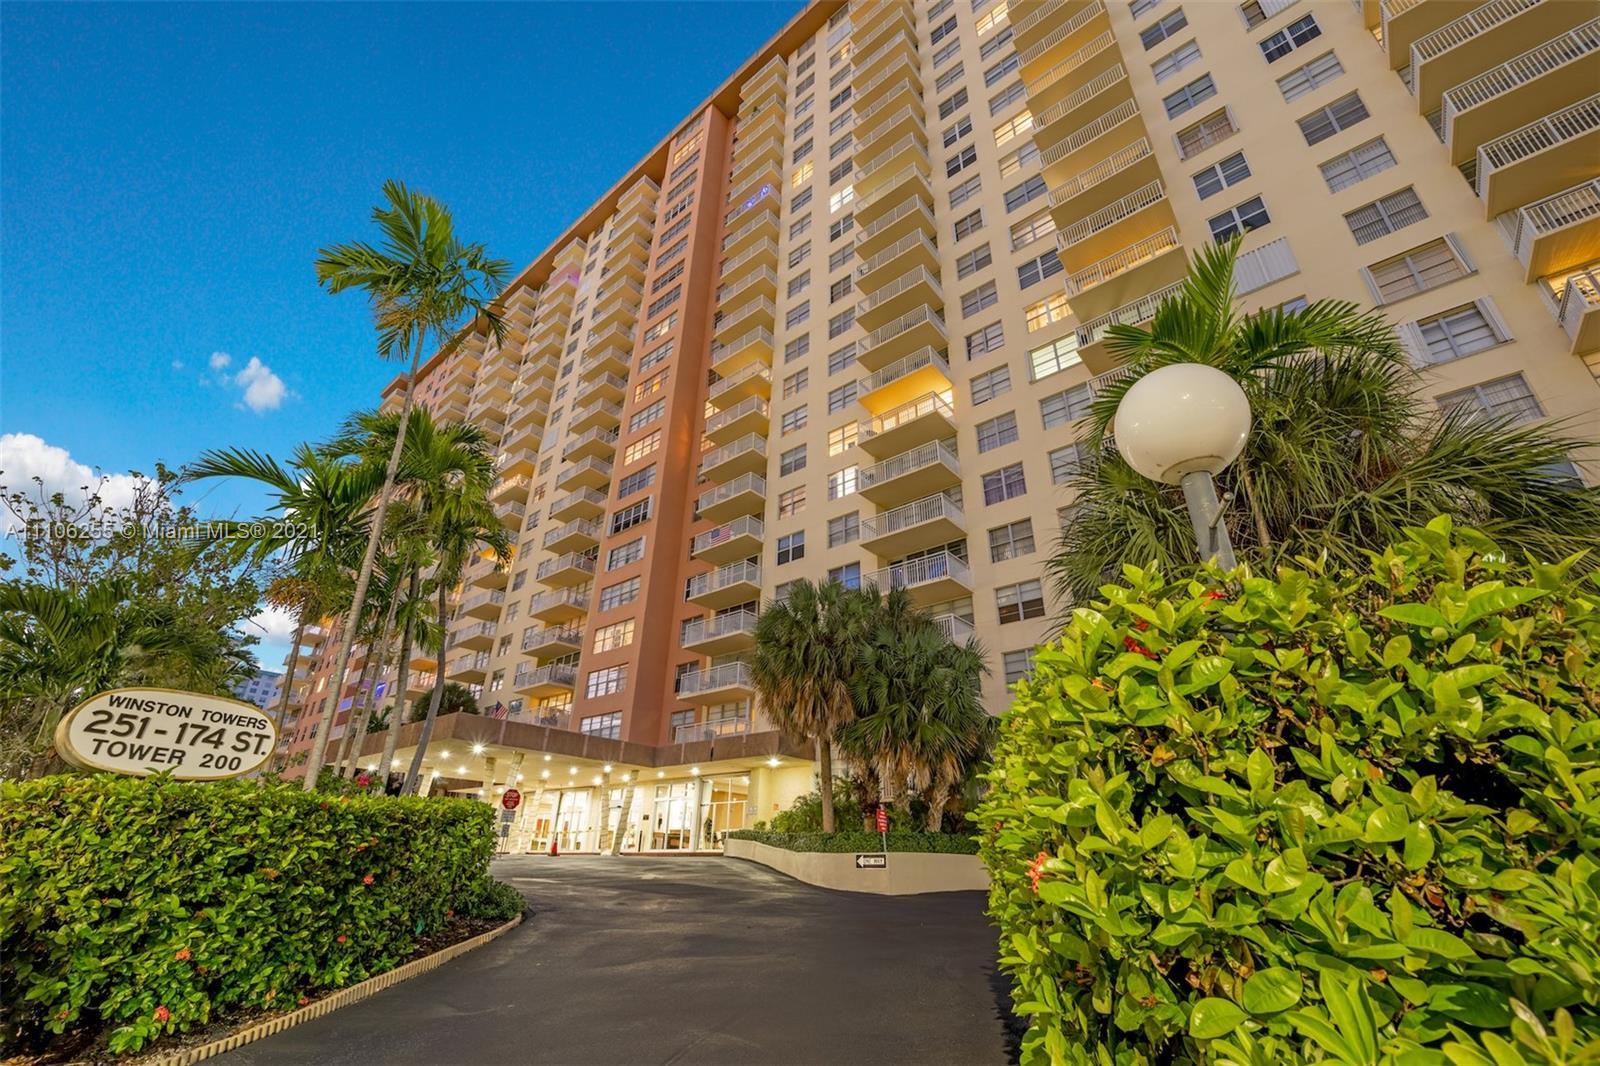 Winston Tower 200 #515 - 251 NE 174th St #515, Sunny Isles Beach, FL 33160